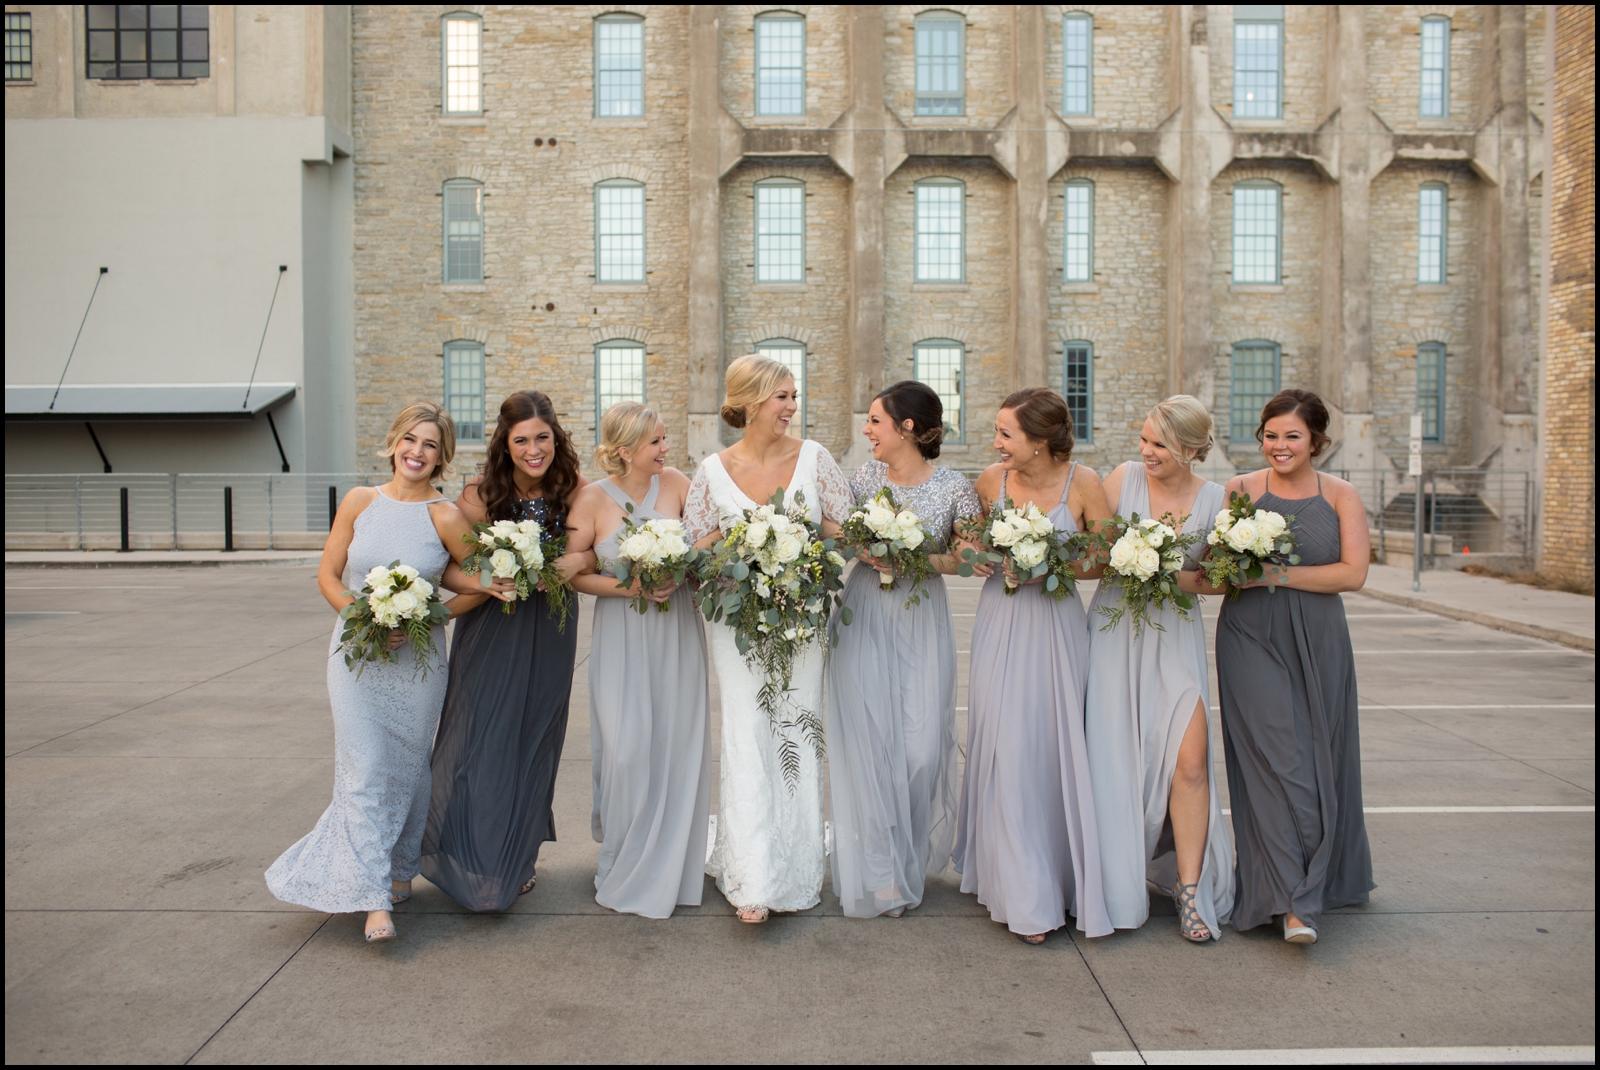 Bridesmaids holding bridal bouquets